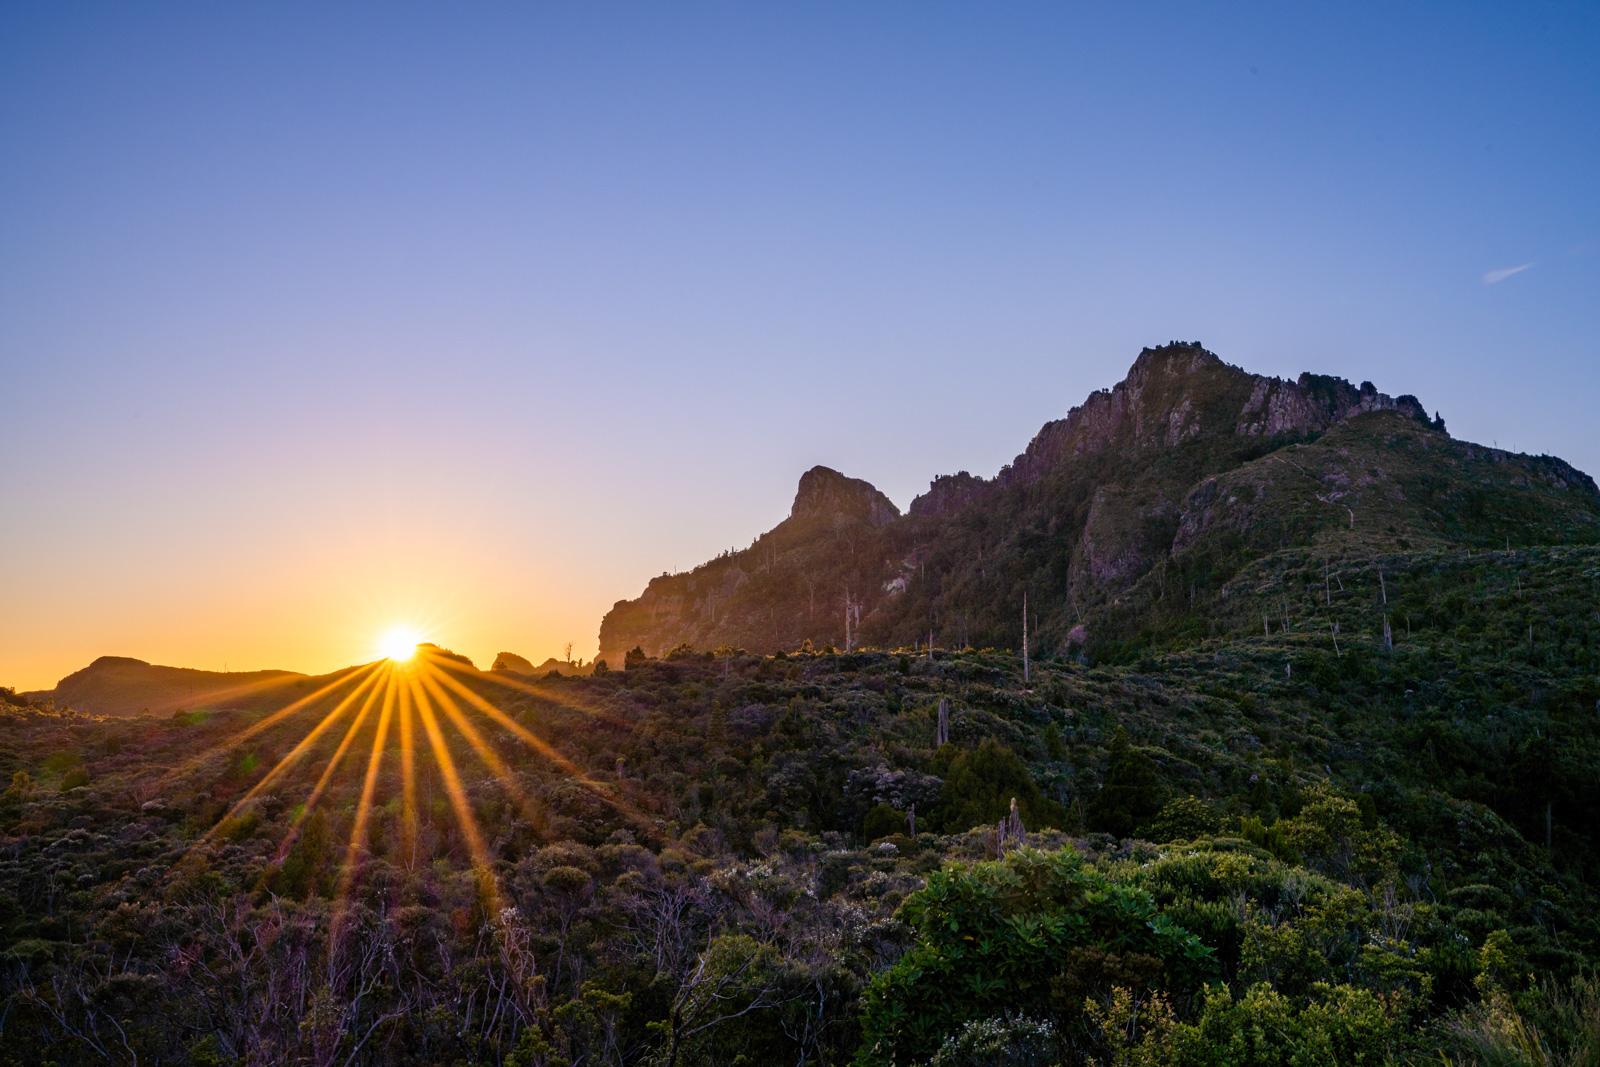 Sunrise at The Pinnacles Coromandel